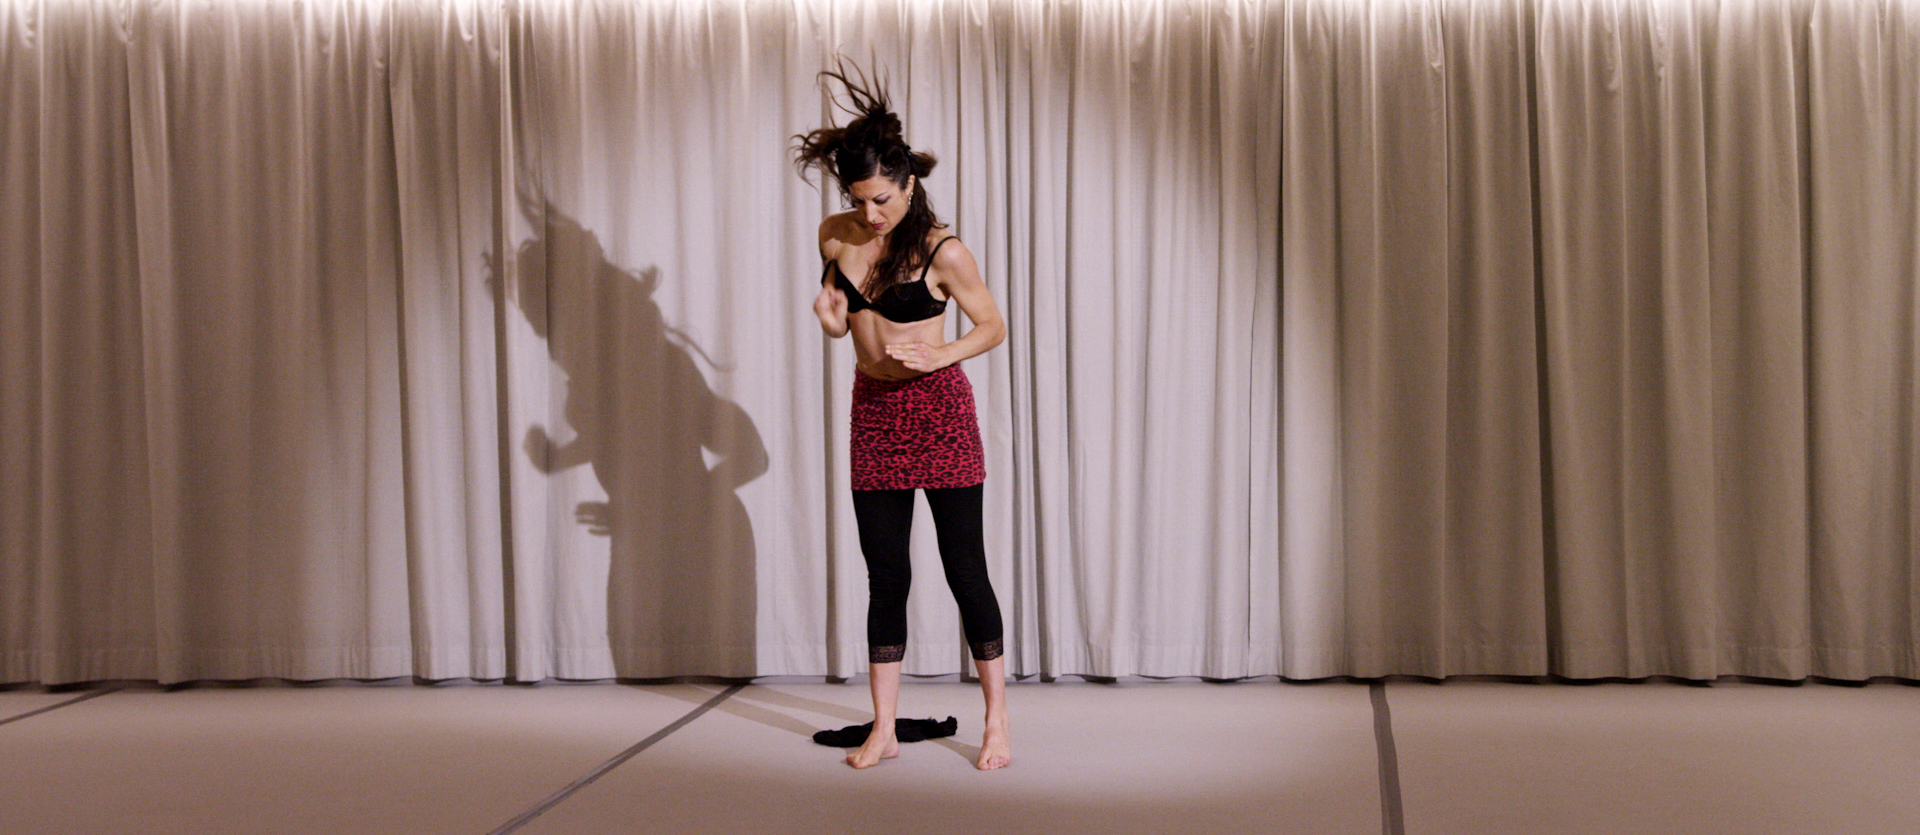 inside_dance_09